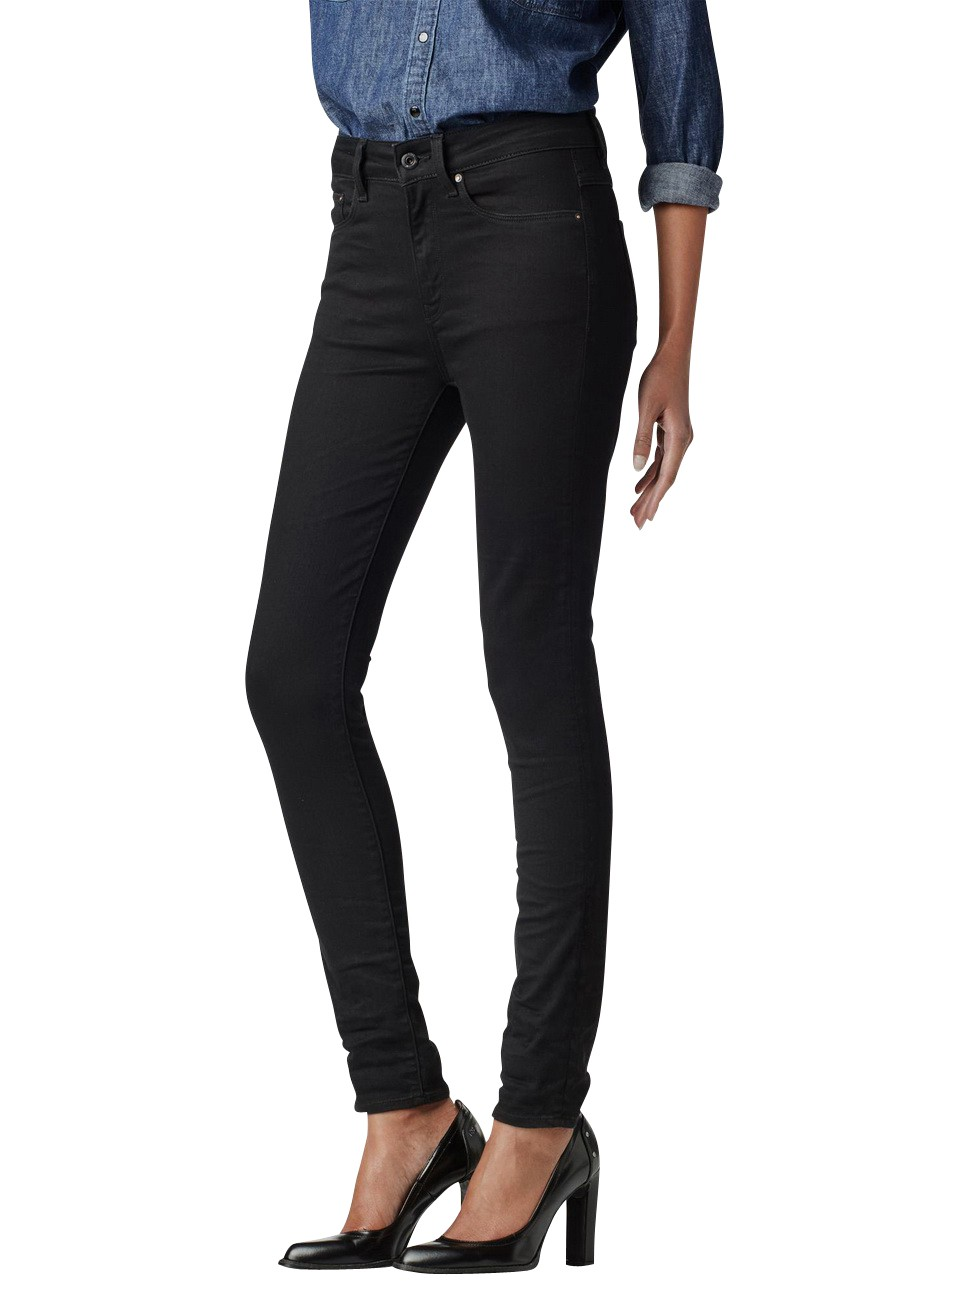 g star damen jeans ruby ultra high skinny dark aged ebay. Black Bedroom Furniture Sets. Home Design Ideas